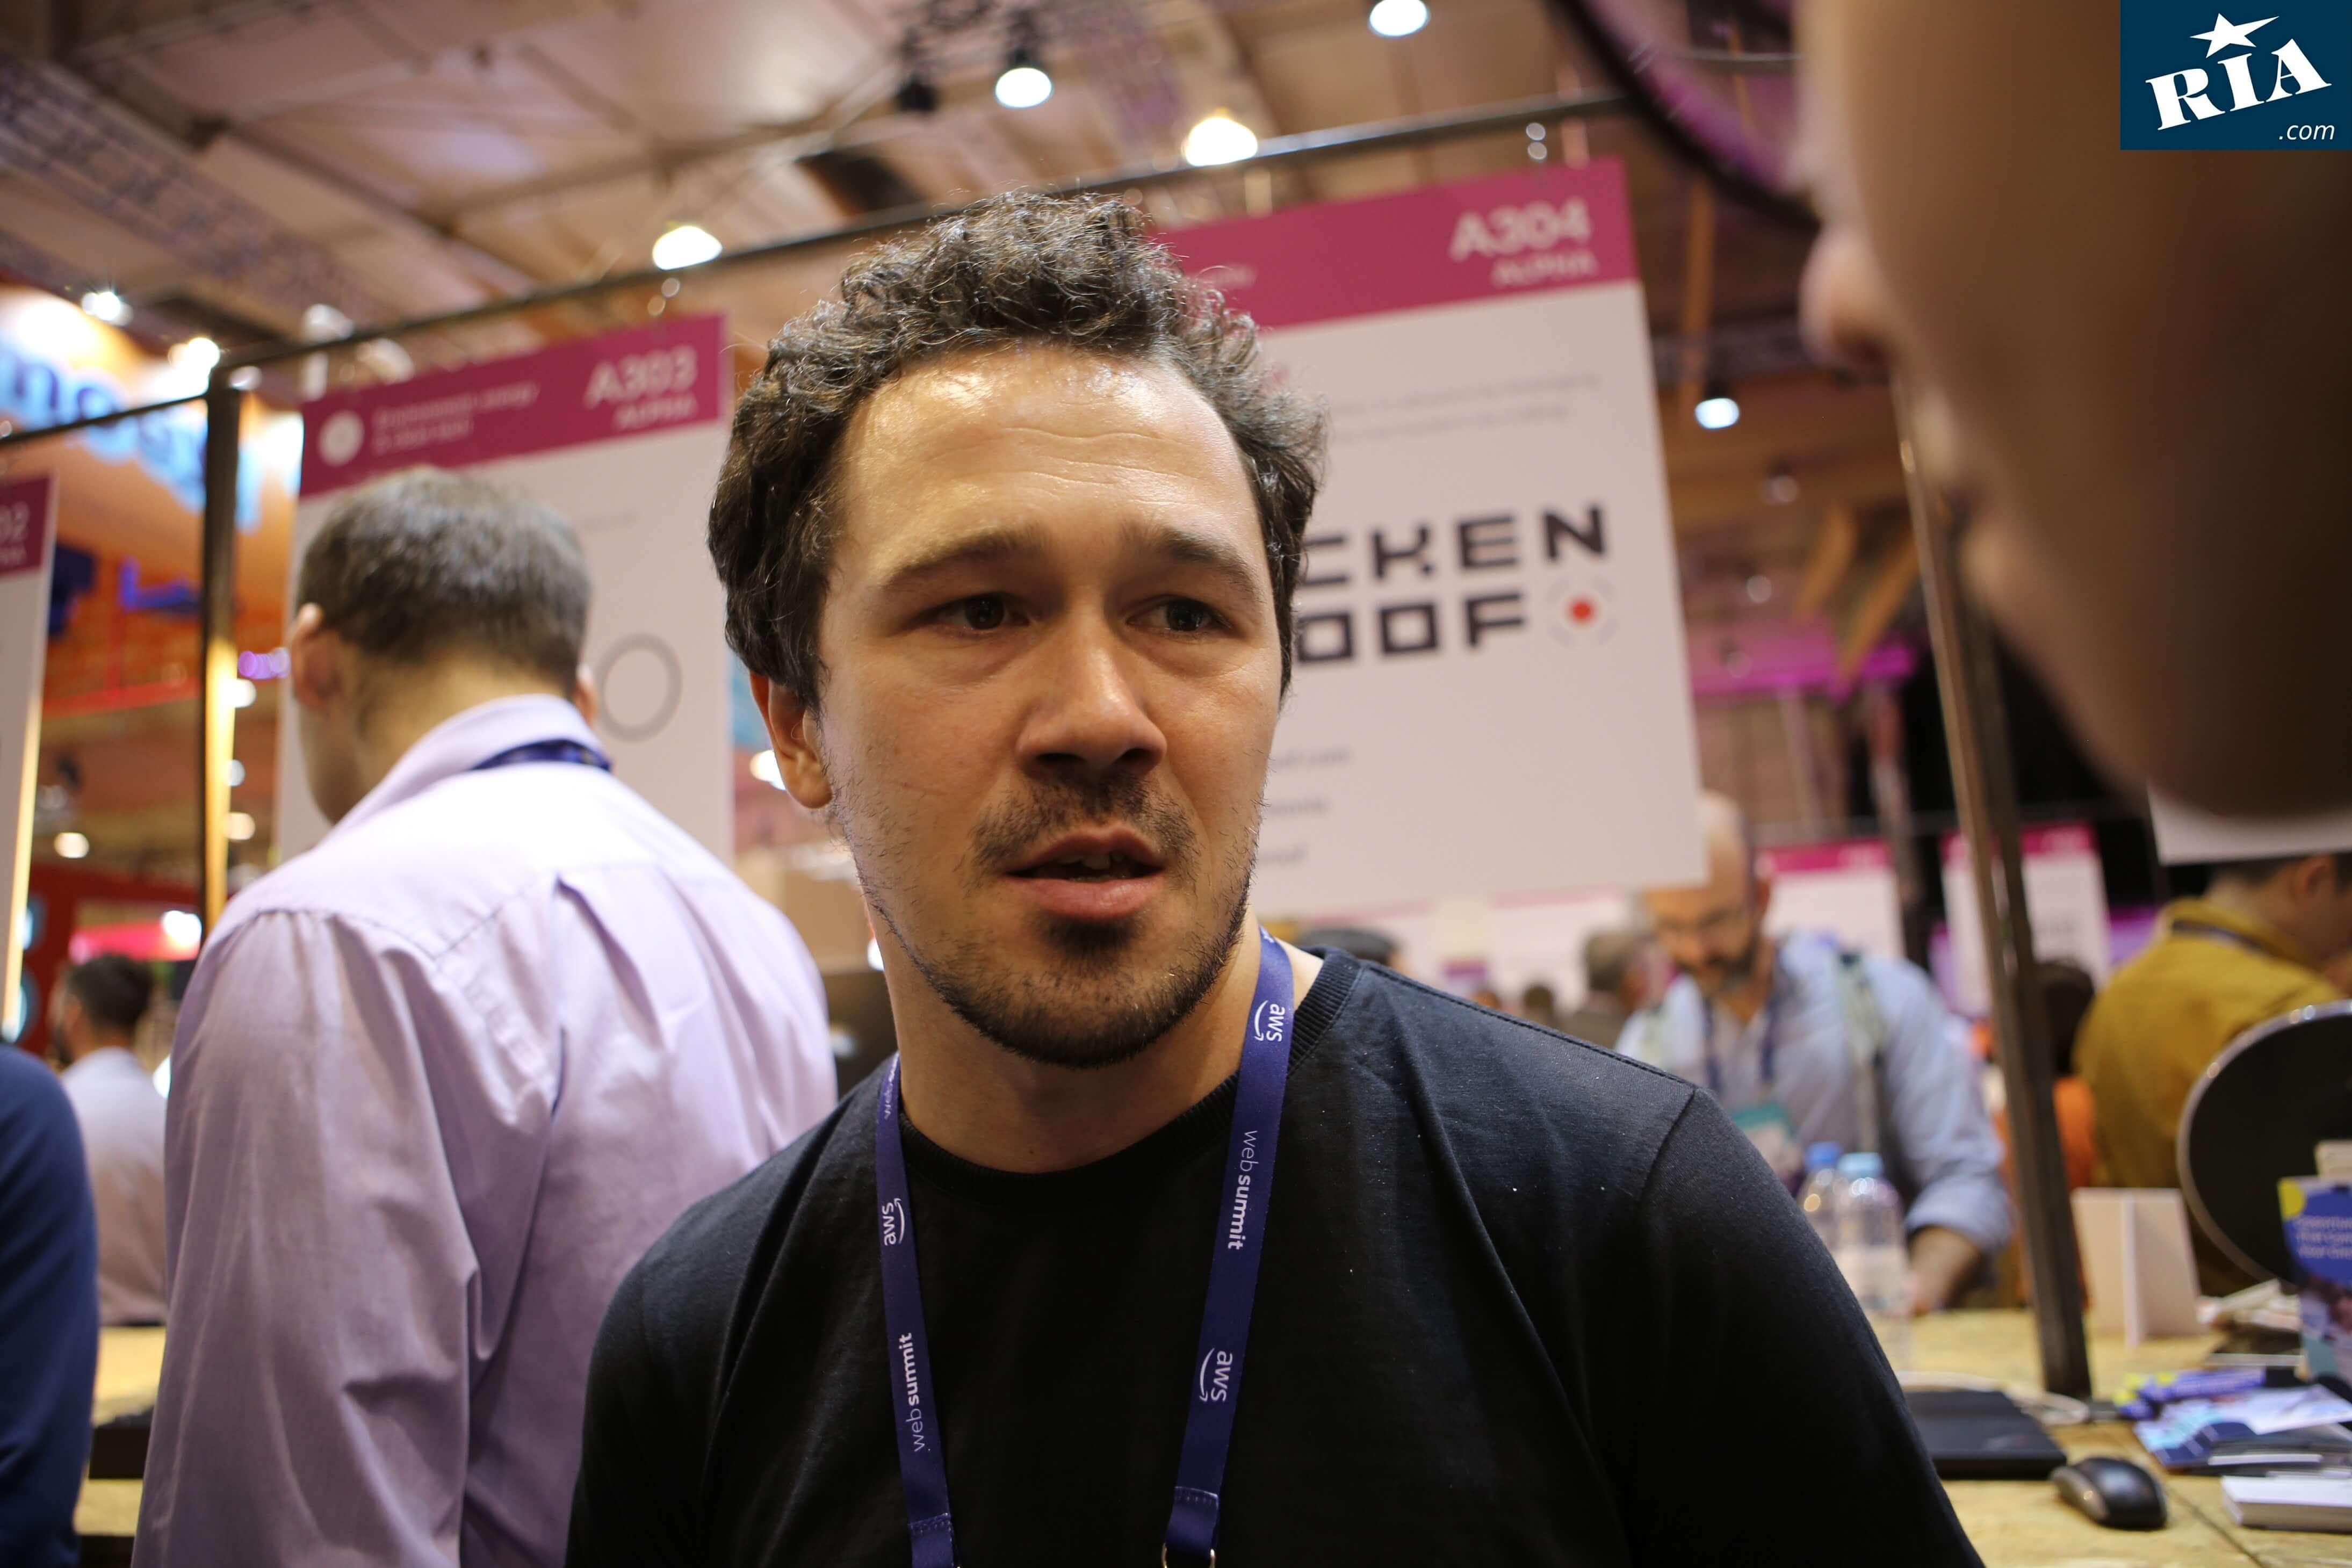 Andrew Matiukhin, HackenProof